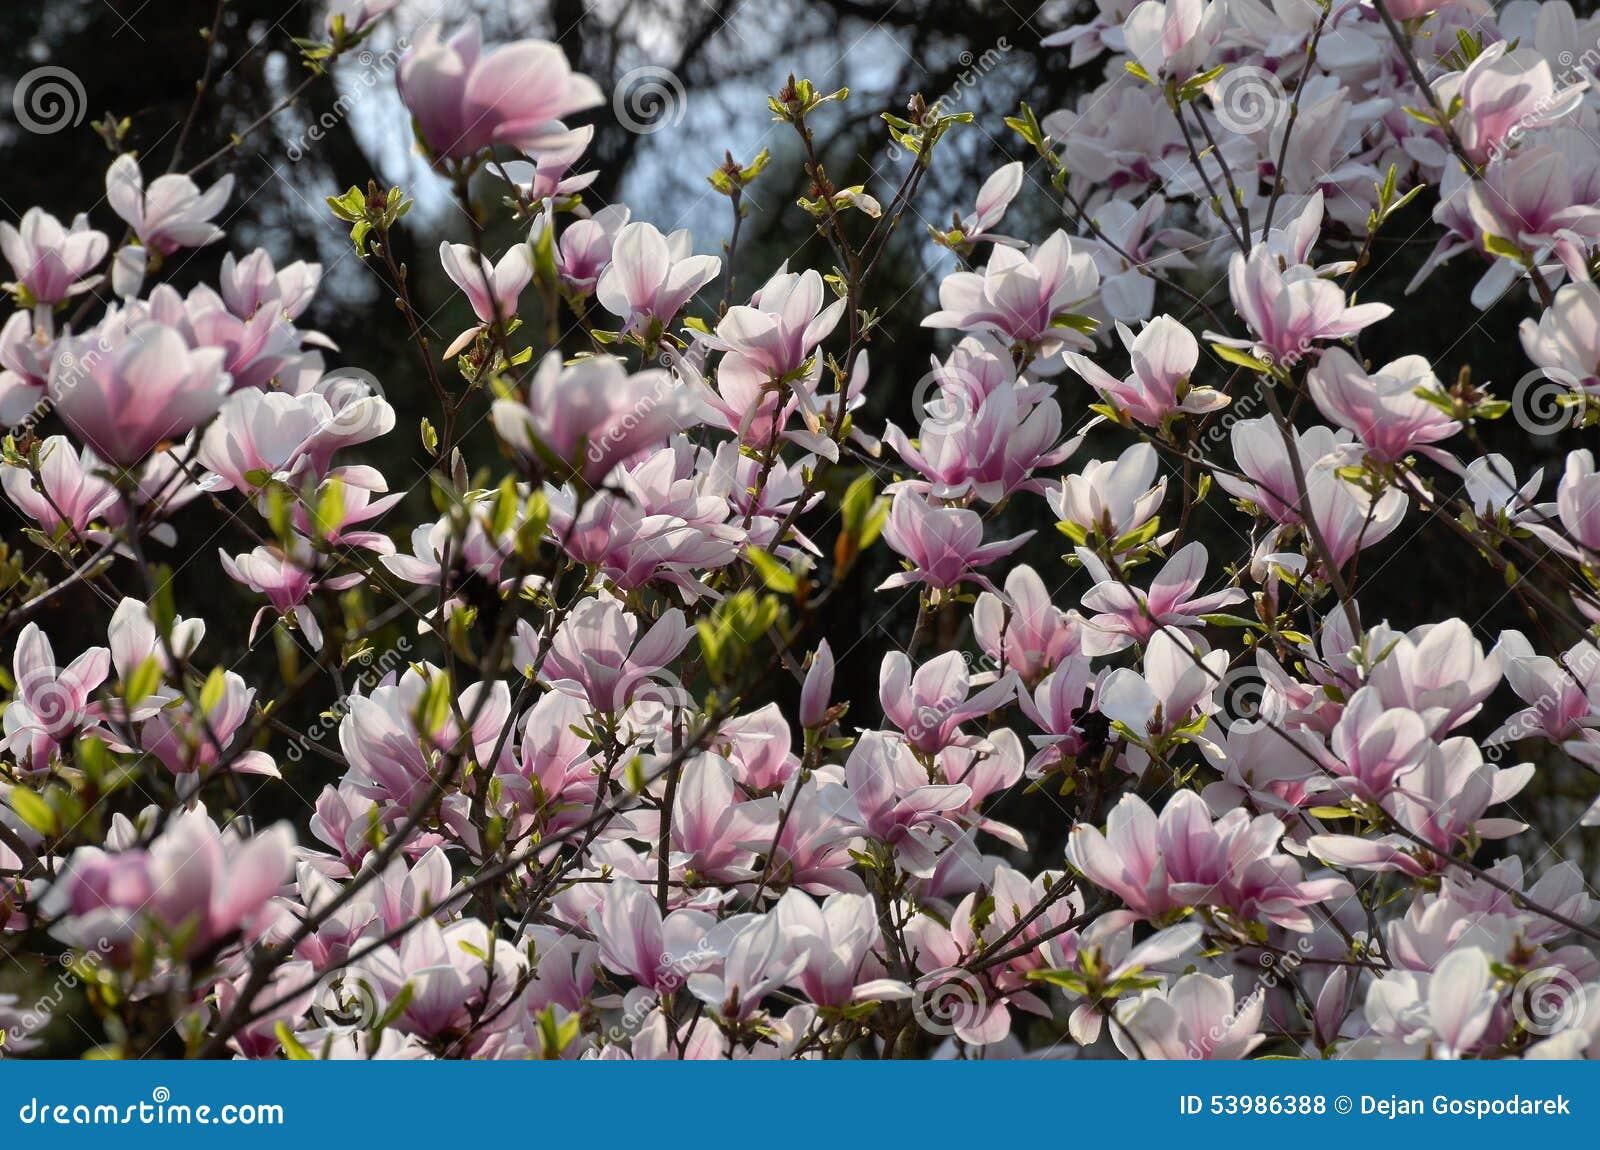 magnolia x soulangeana alexandrina stock photo image. Black Bedroom Furniture Sets. Home Design Ideas